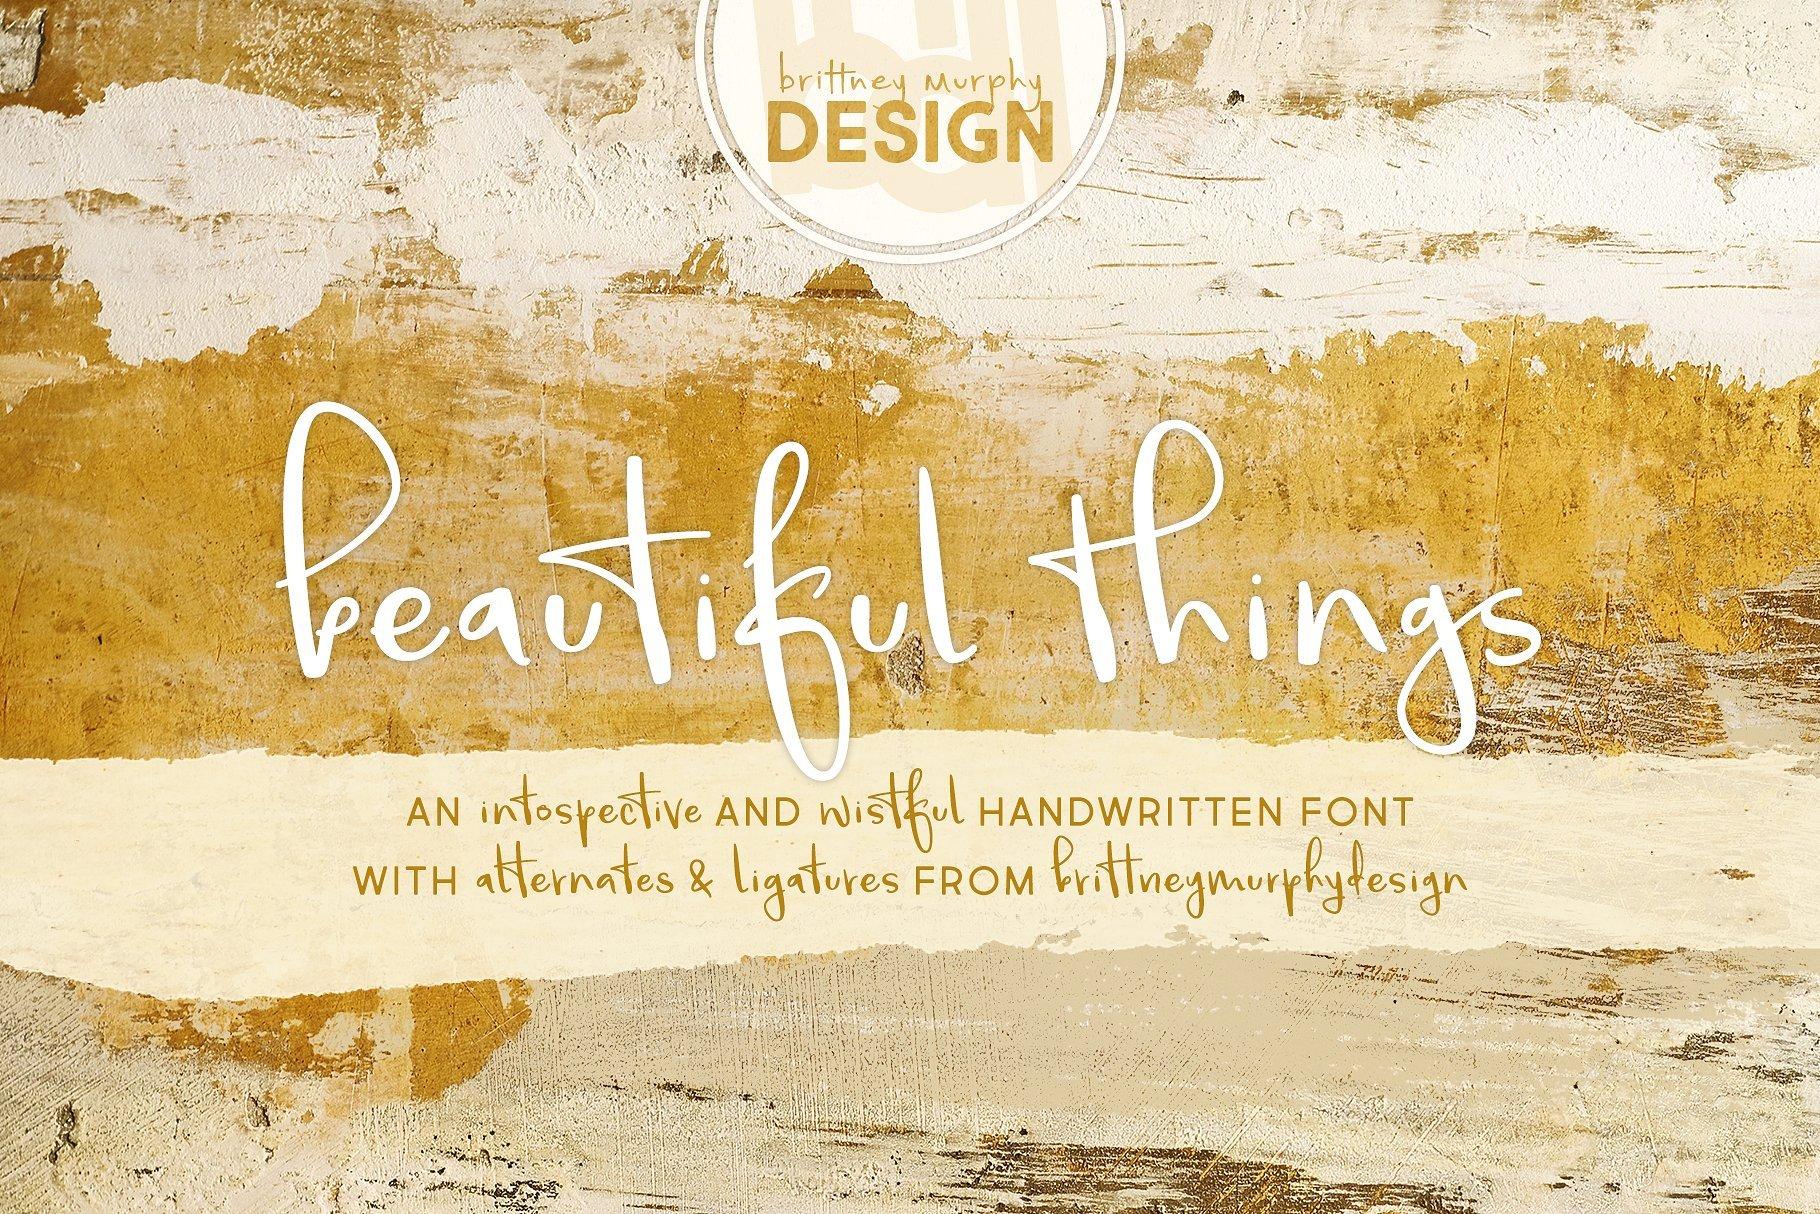 https://fontclarity.com/wp-content/uploads/2019/09/beautiful-things-handwritten-font-download-0.jpg Free Download